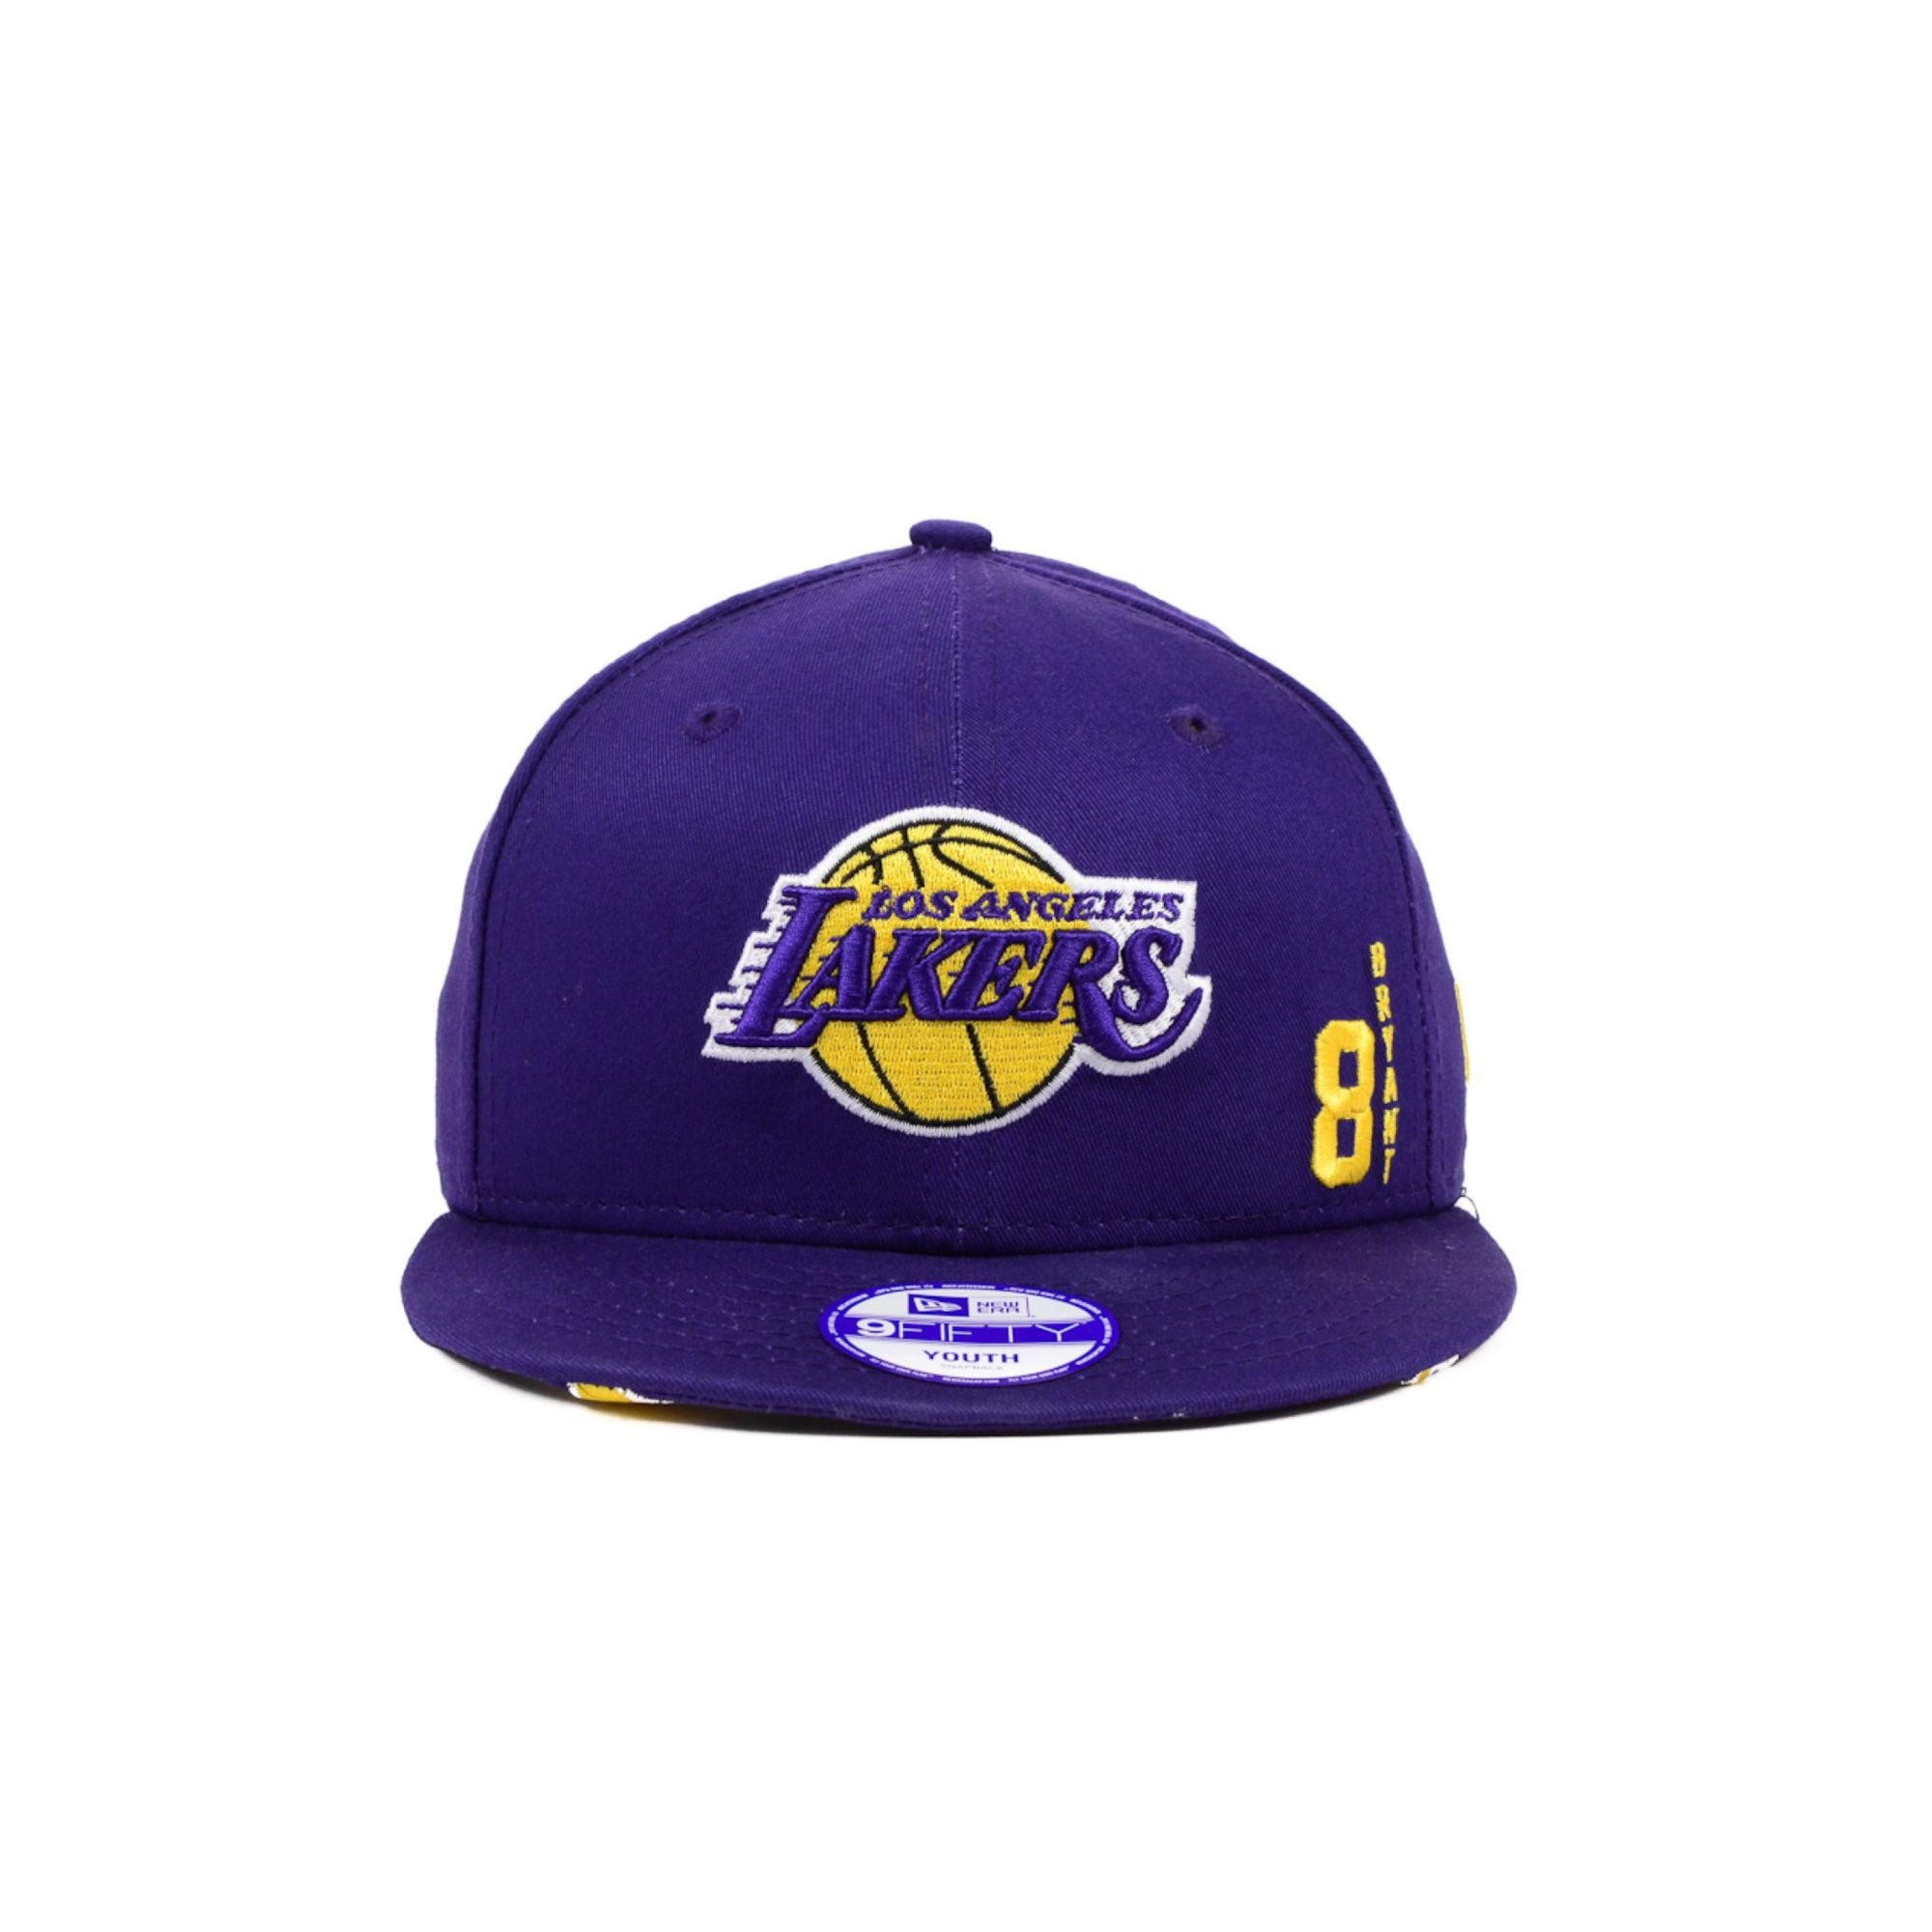 official photos f58ae 1c117 KTZ Kids Kobe Bryant Los Angeles Lakers Hardwood Classics 9fifty ...